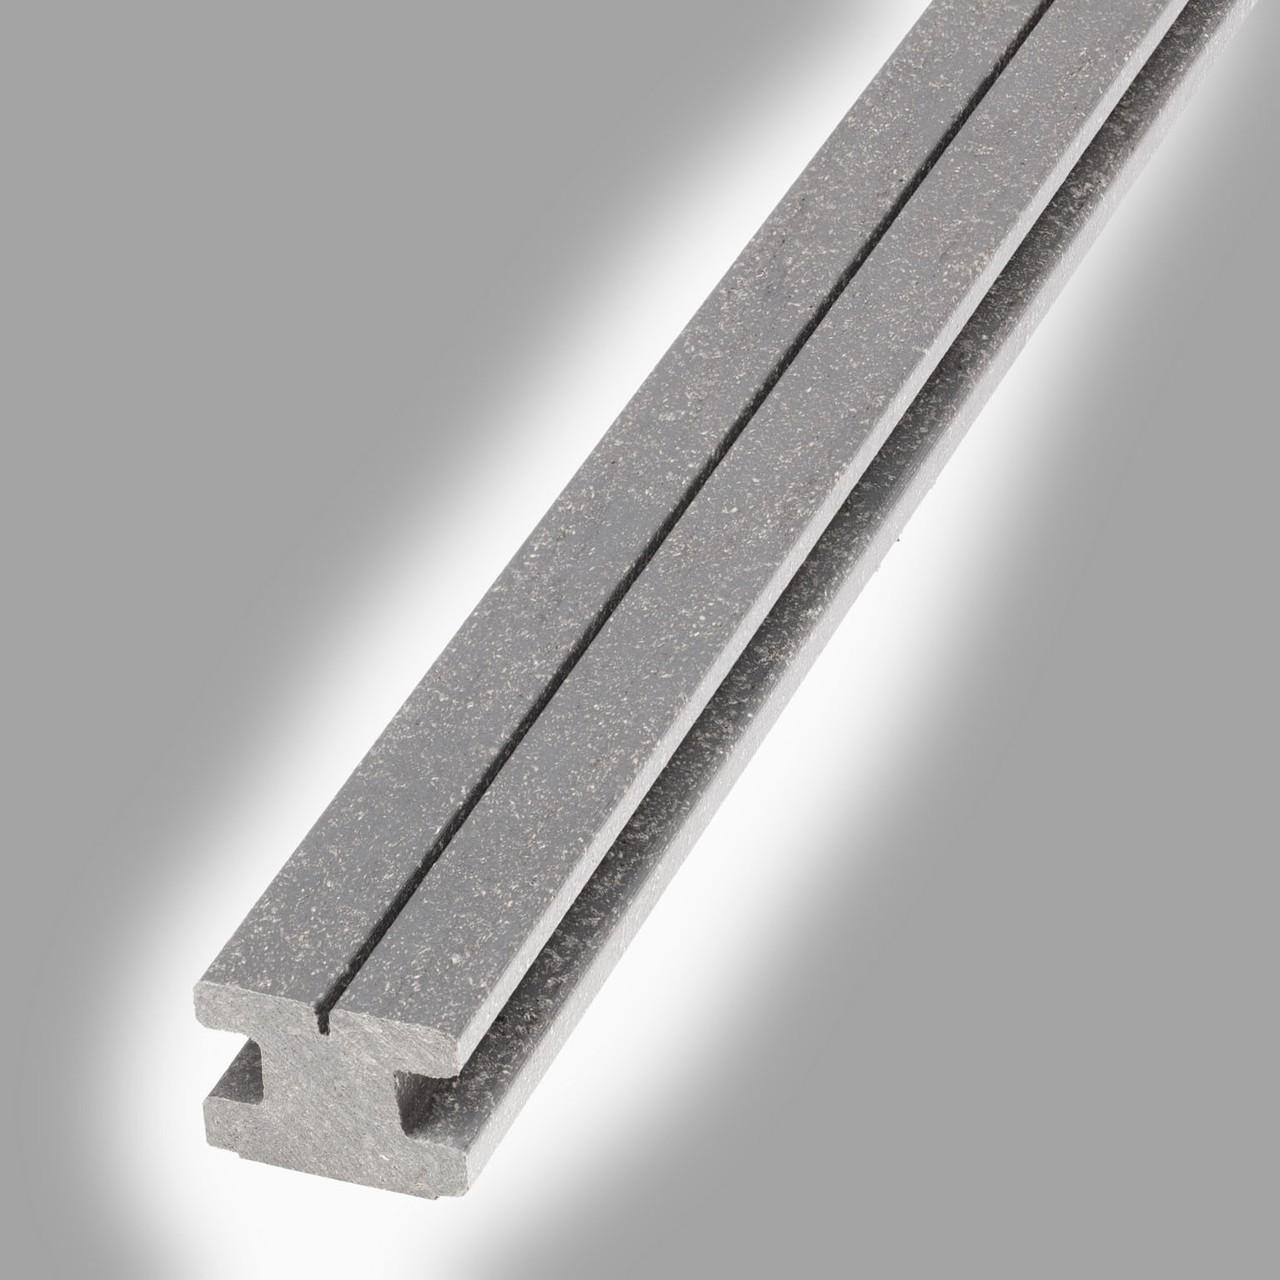 Unterkonstruktionsprofil H1 (30 x 40 x 2400 mm)